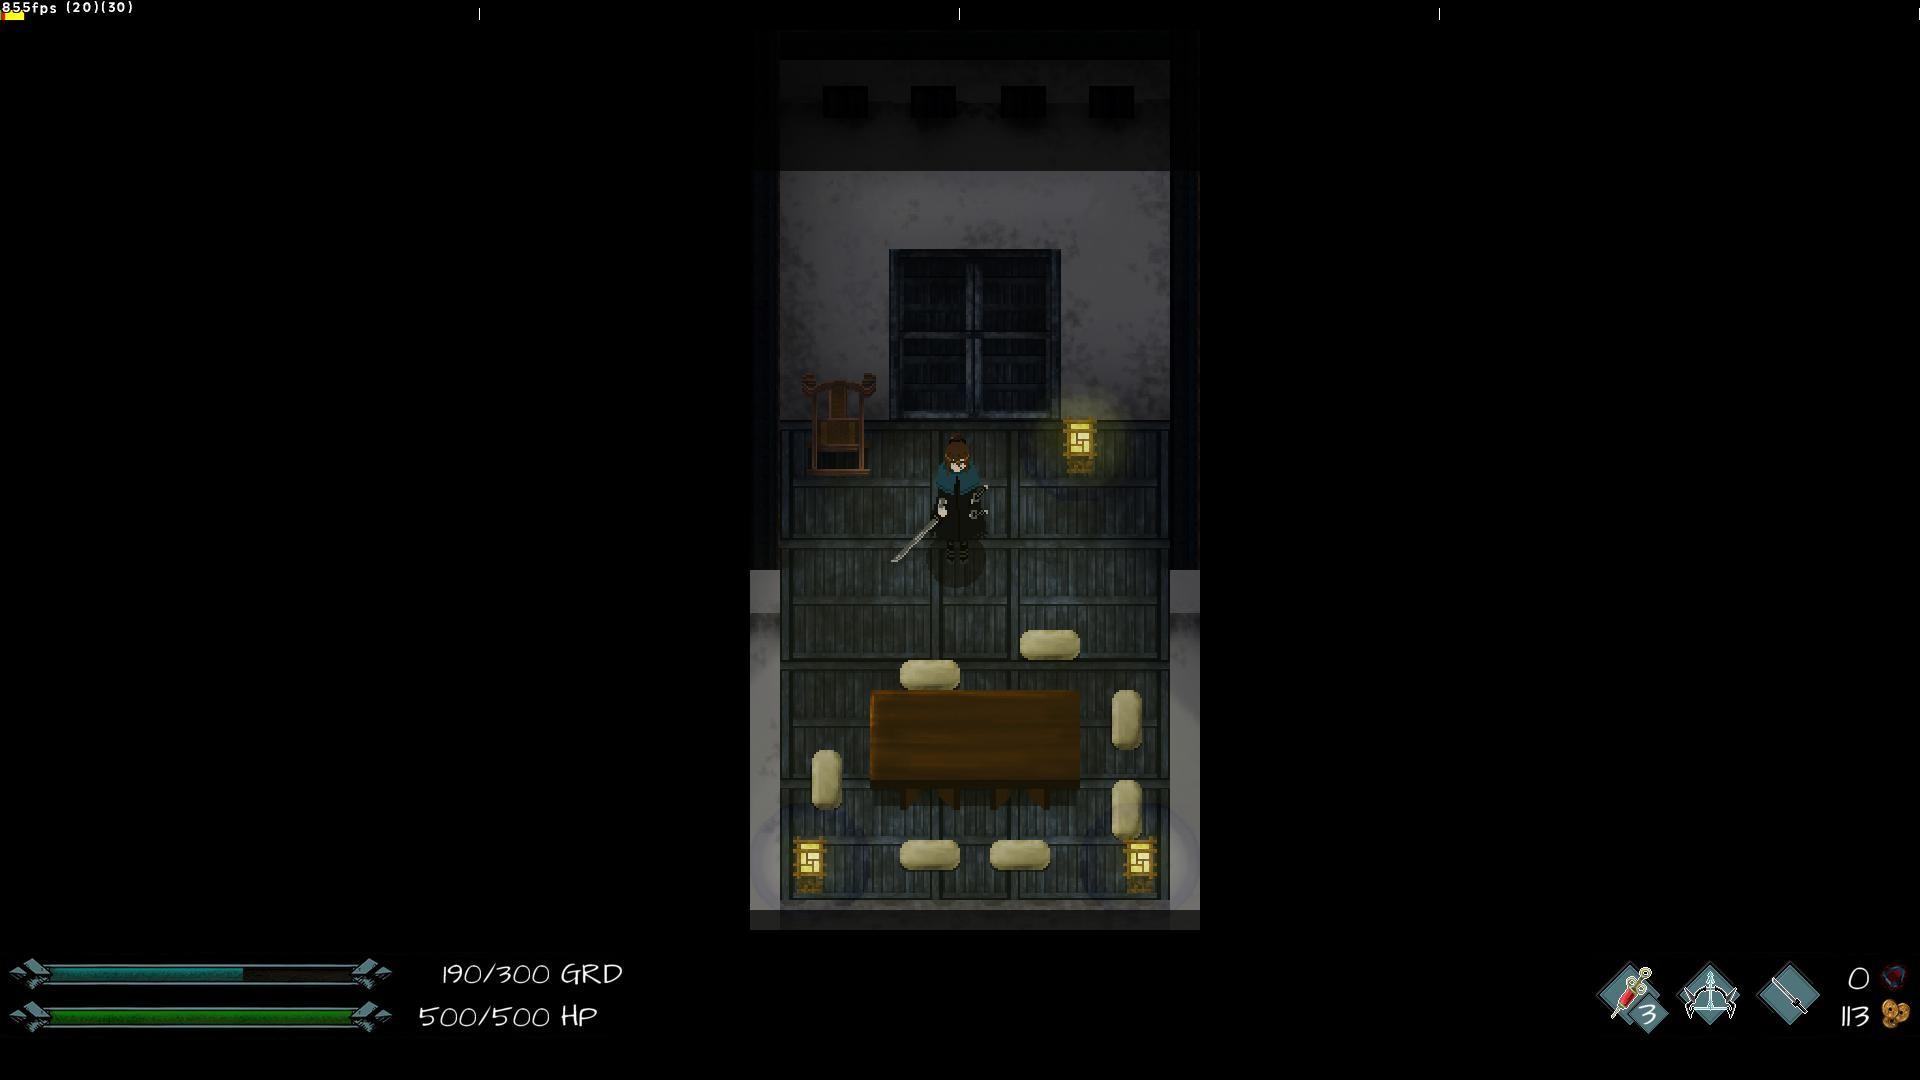 Skautfold: Moonless Knight Free Download